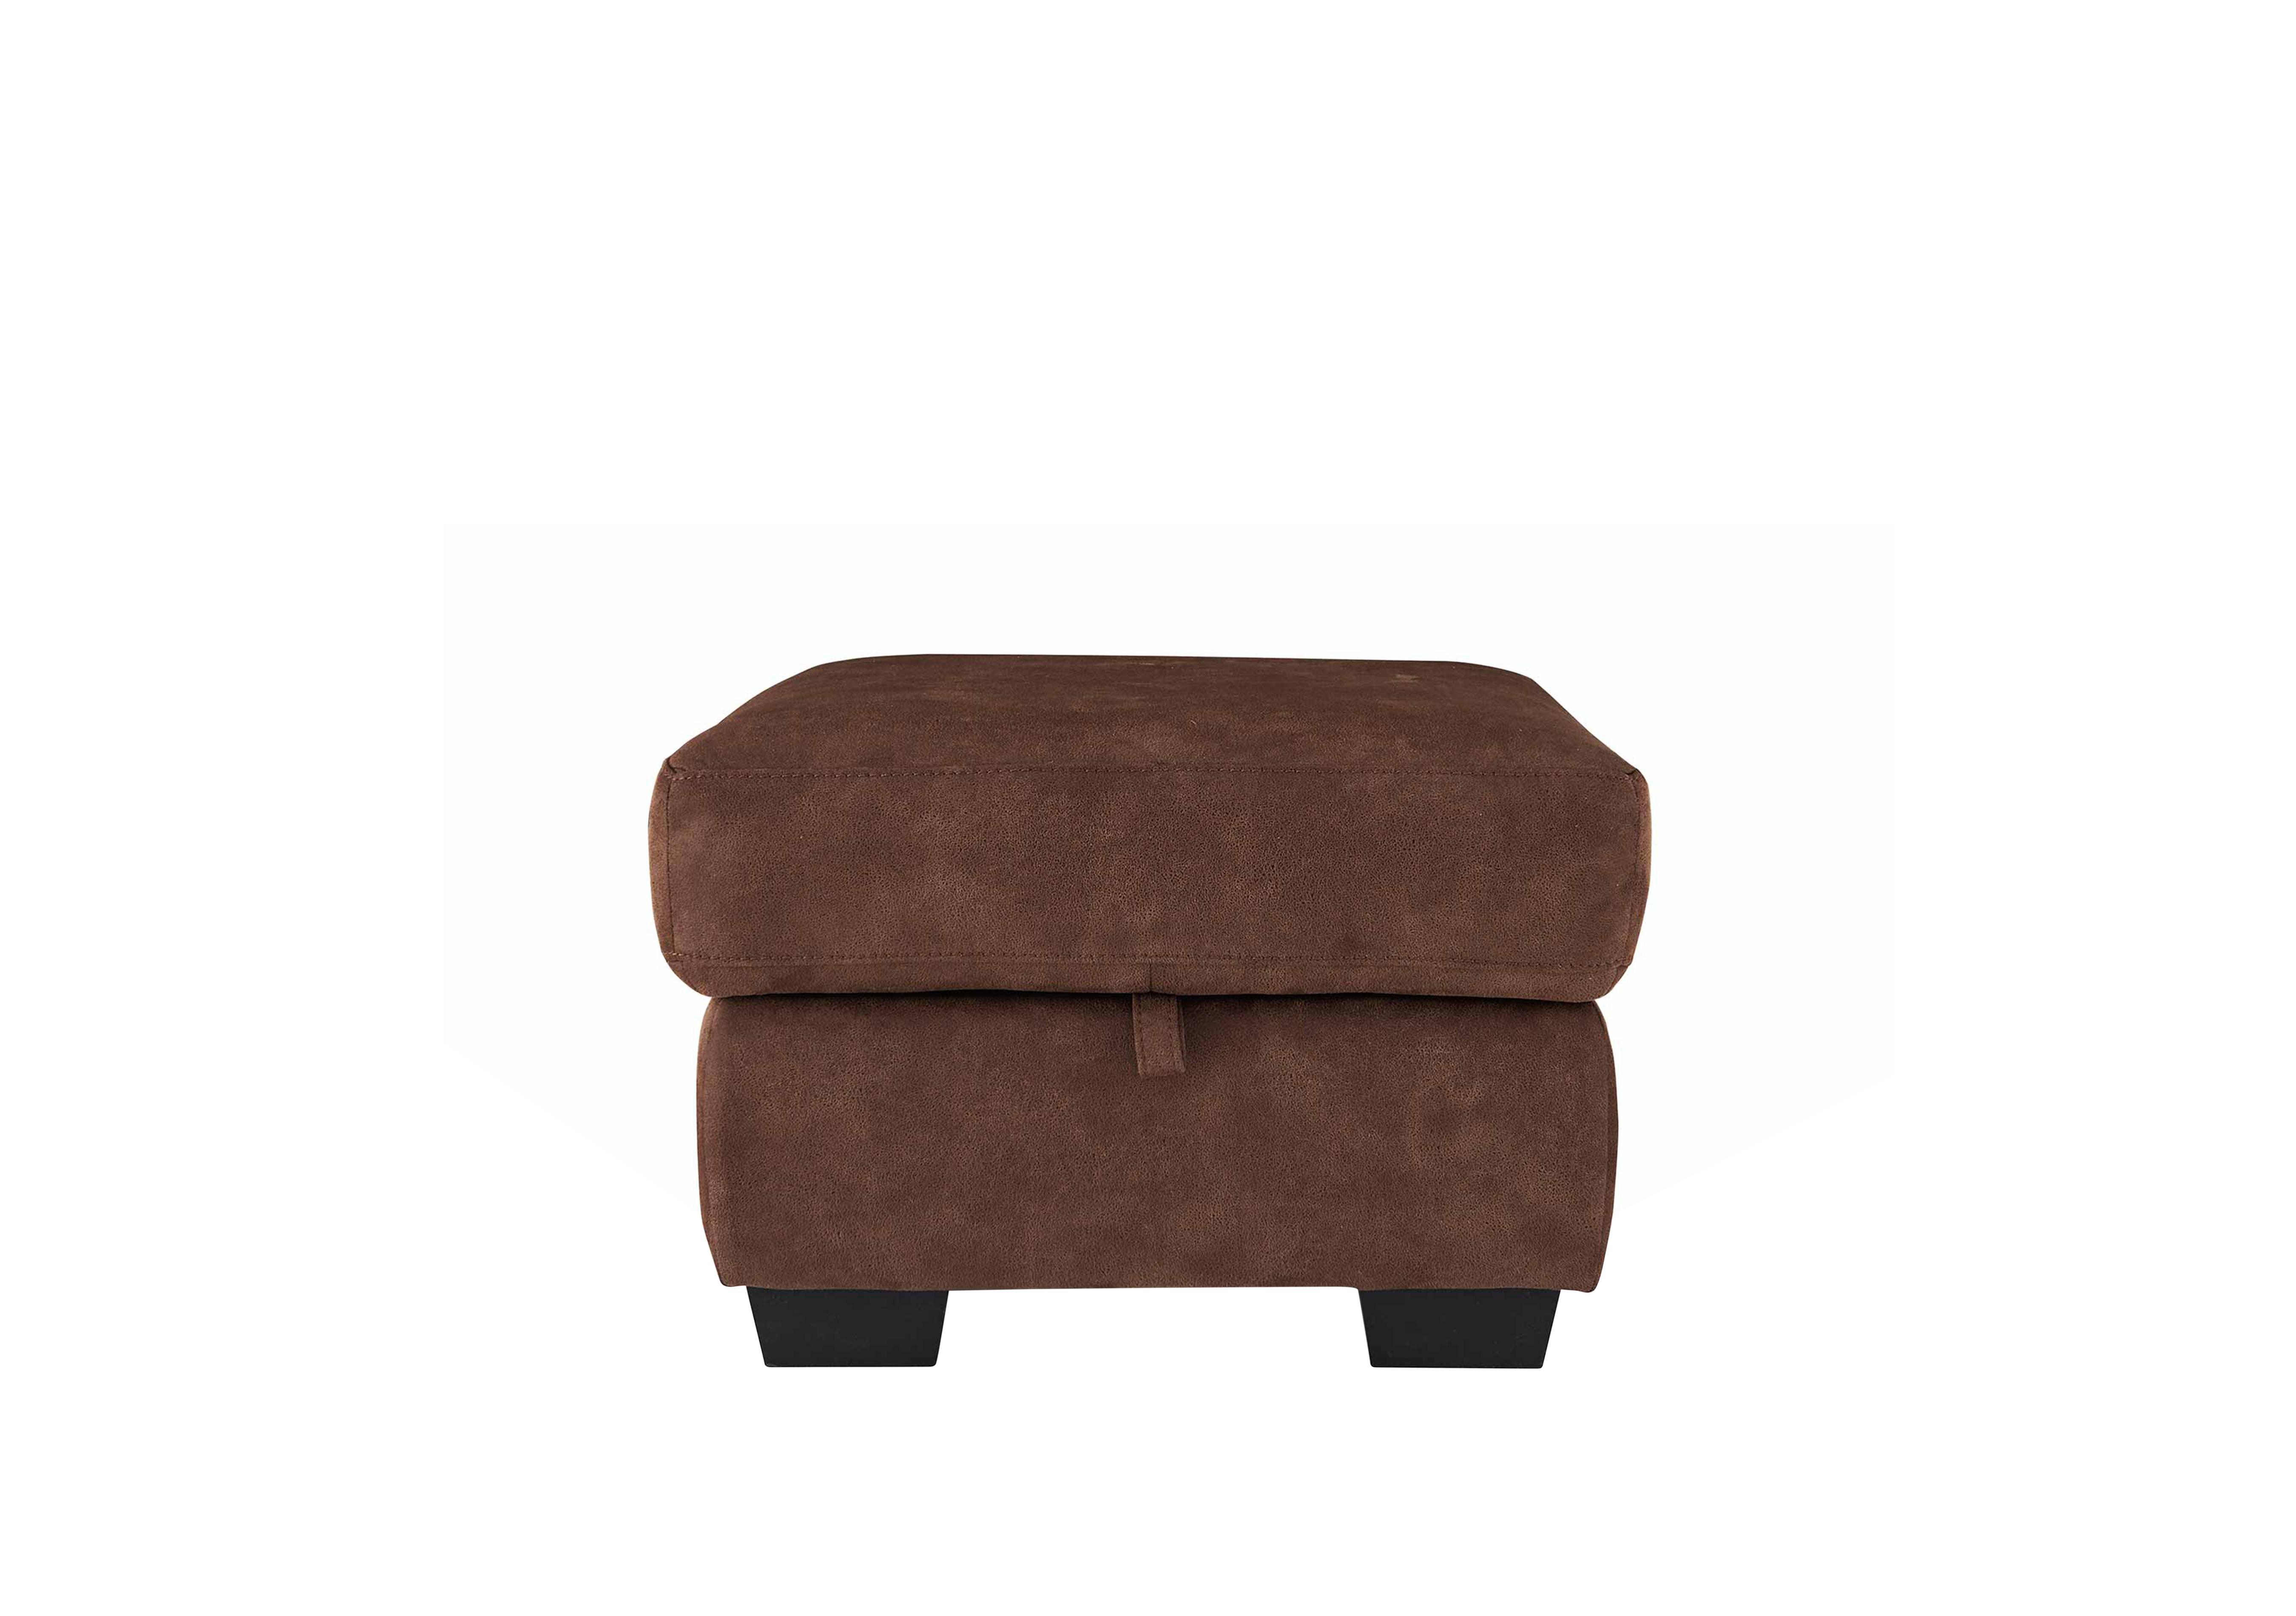 Plain Furniture Village Dante Sofa Bed Beautiful S In Decorating